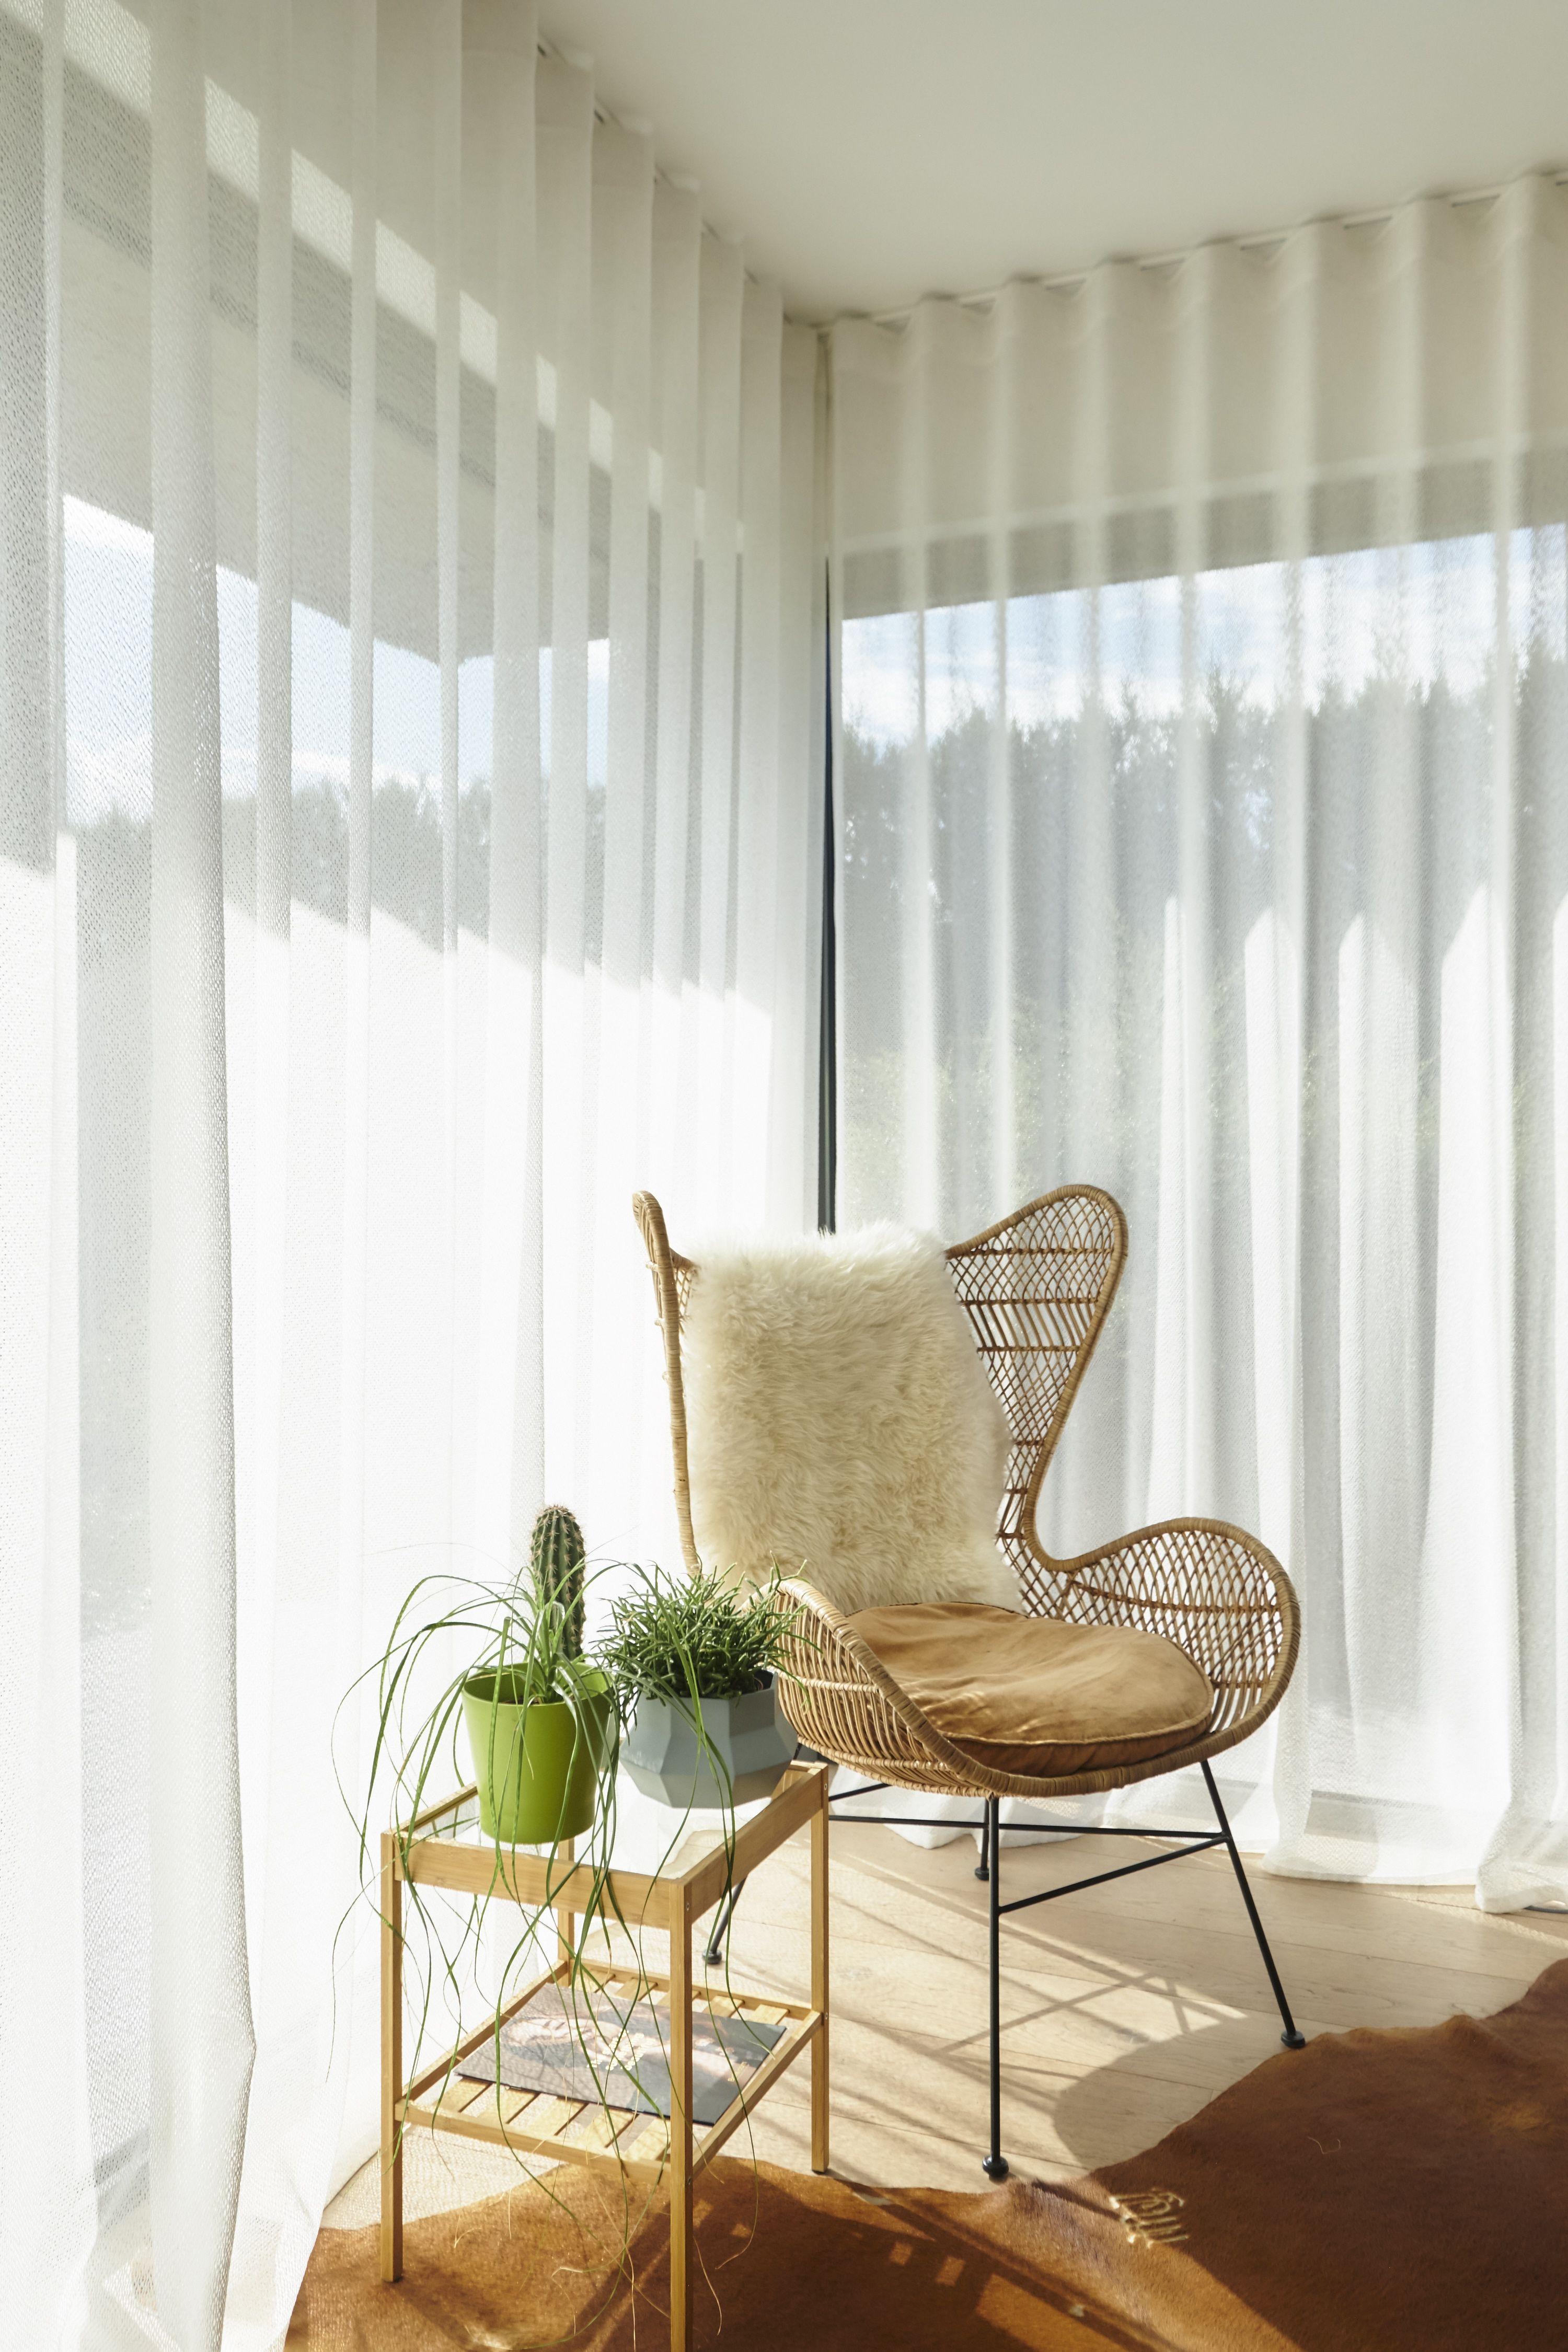 Hk Living Egg Chair.Stoel Egg Chair Hk Living Schapenvacht Ivoor Auskin